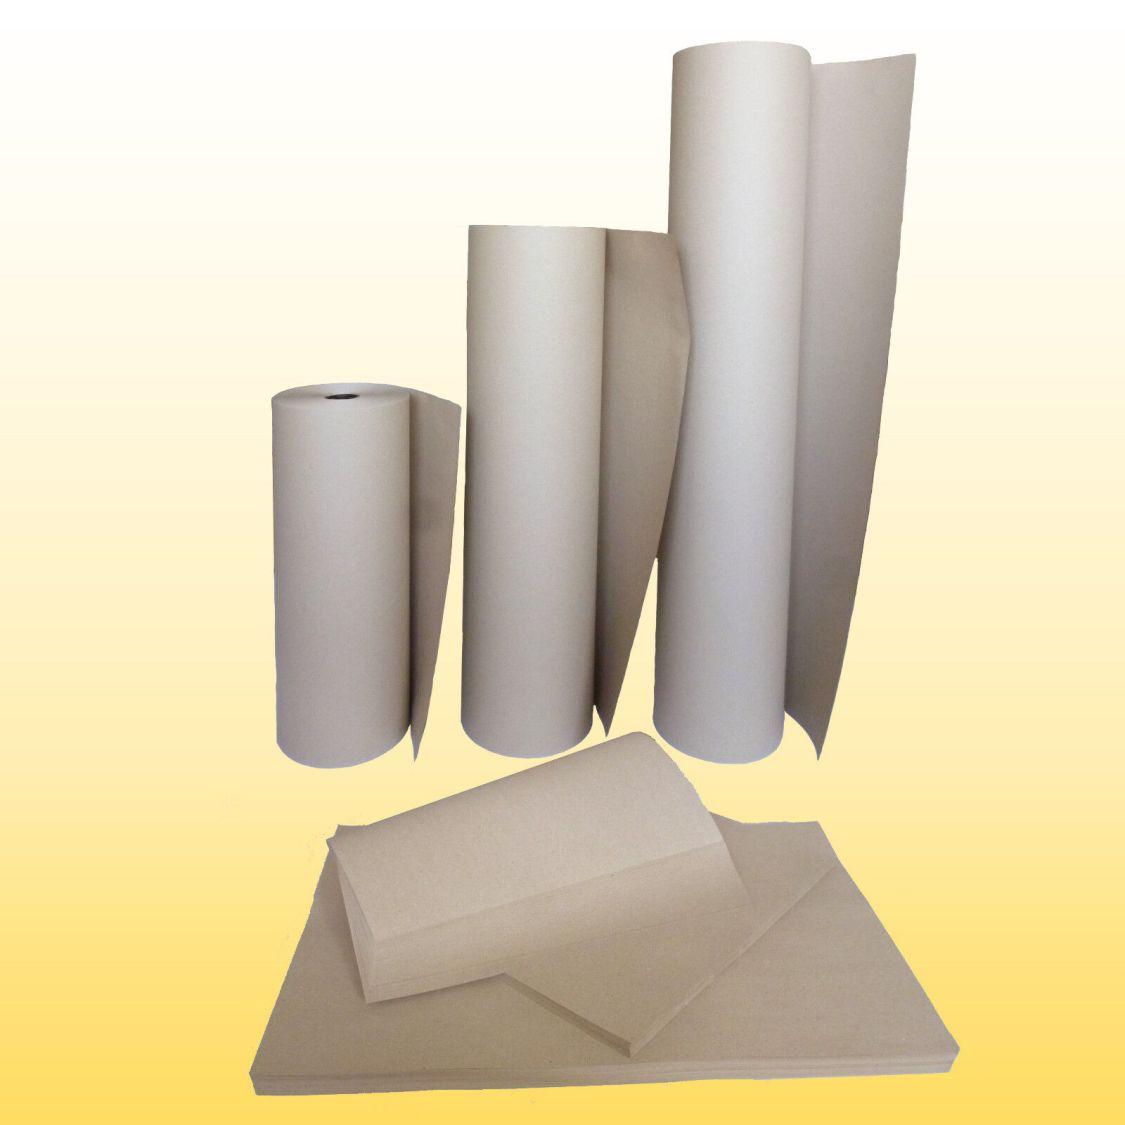 Schrenzpapier 80,100,120 g/m² Packpapier / Rollen 50,75,100 cm / Bogen 50x75 cm